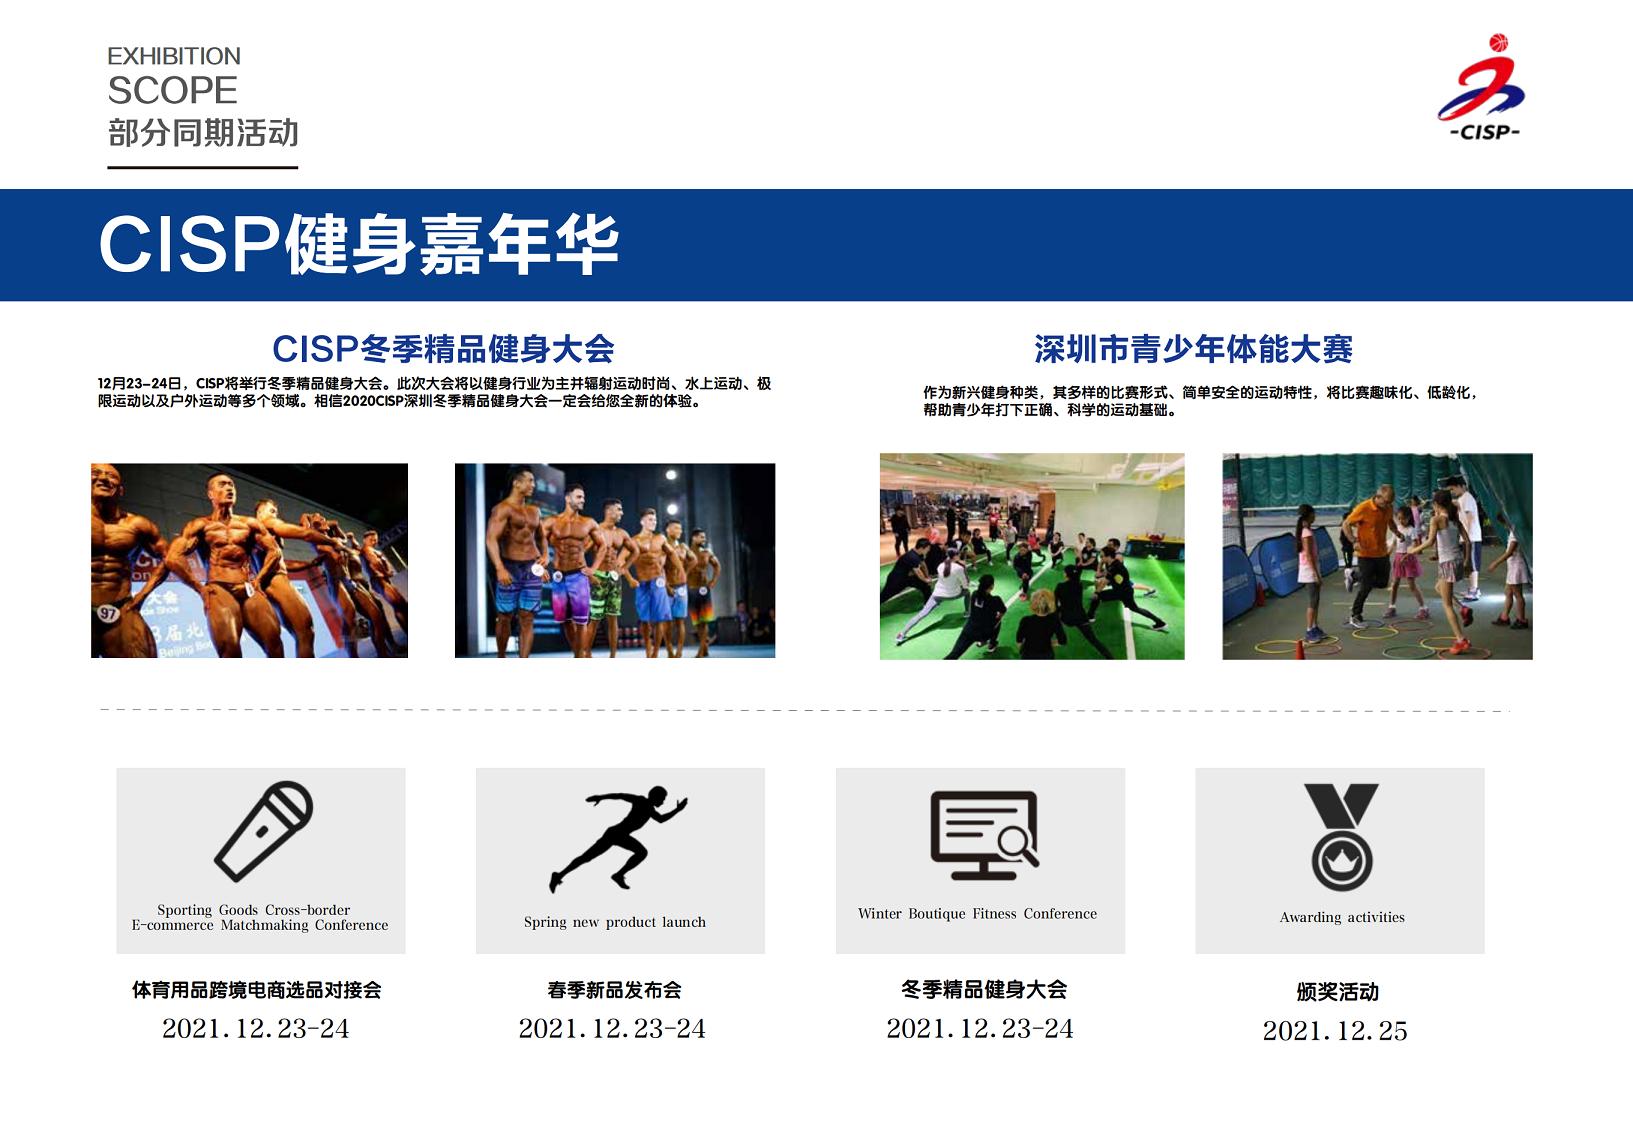 CISP 2021深圳国际健身器材展邀请函-程洋_05.png